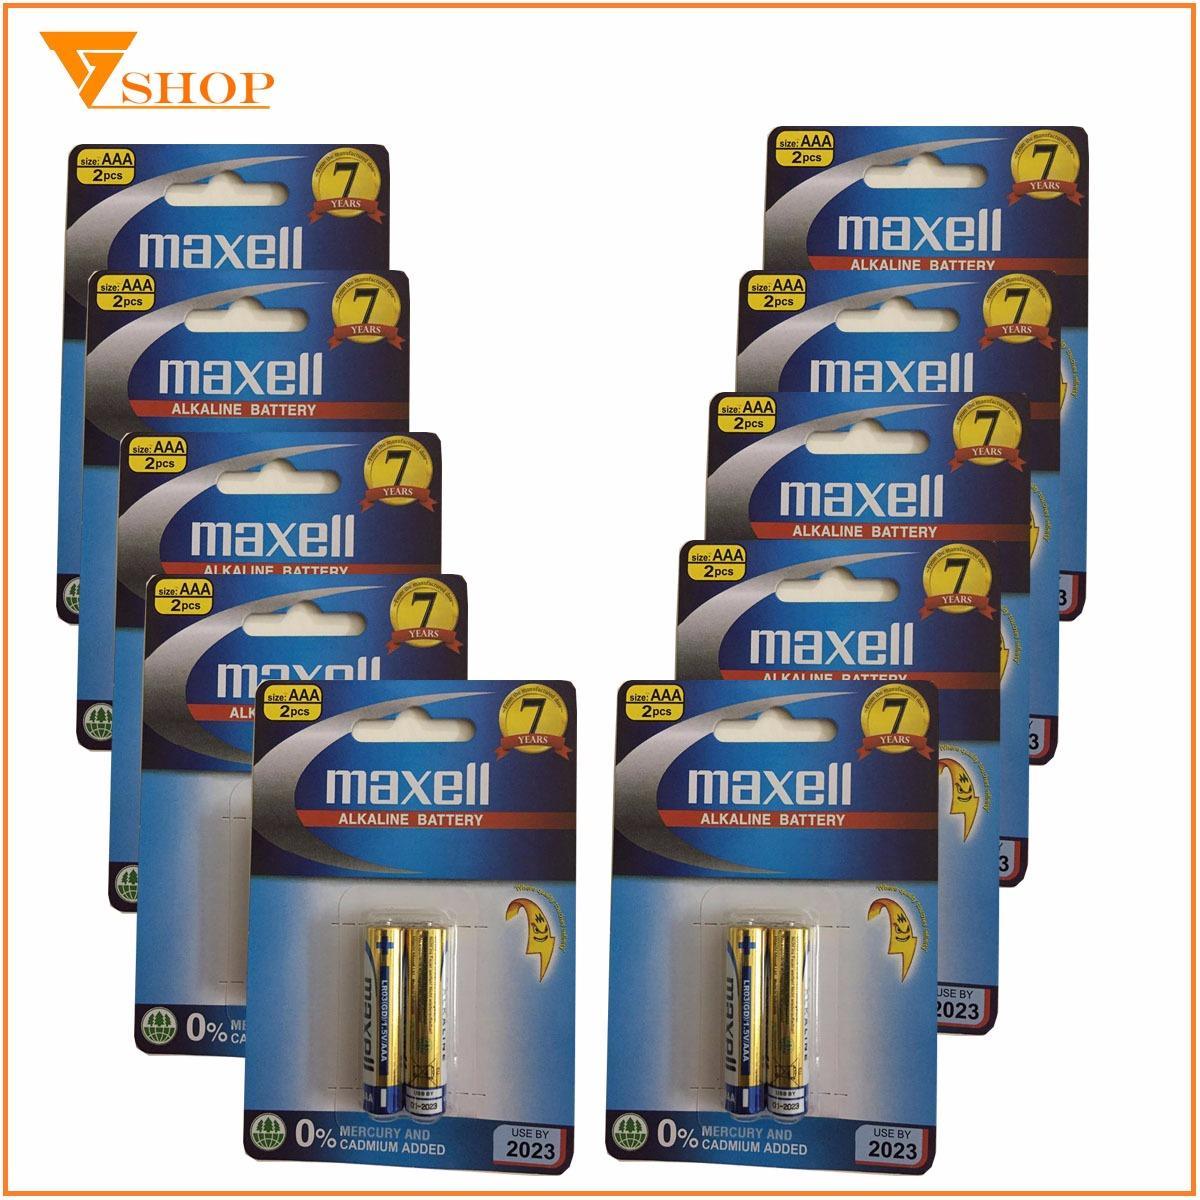 10 vỉ Pin AAA Maxell Alkaline 1.5 V